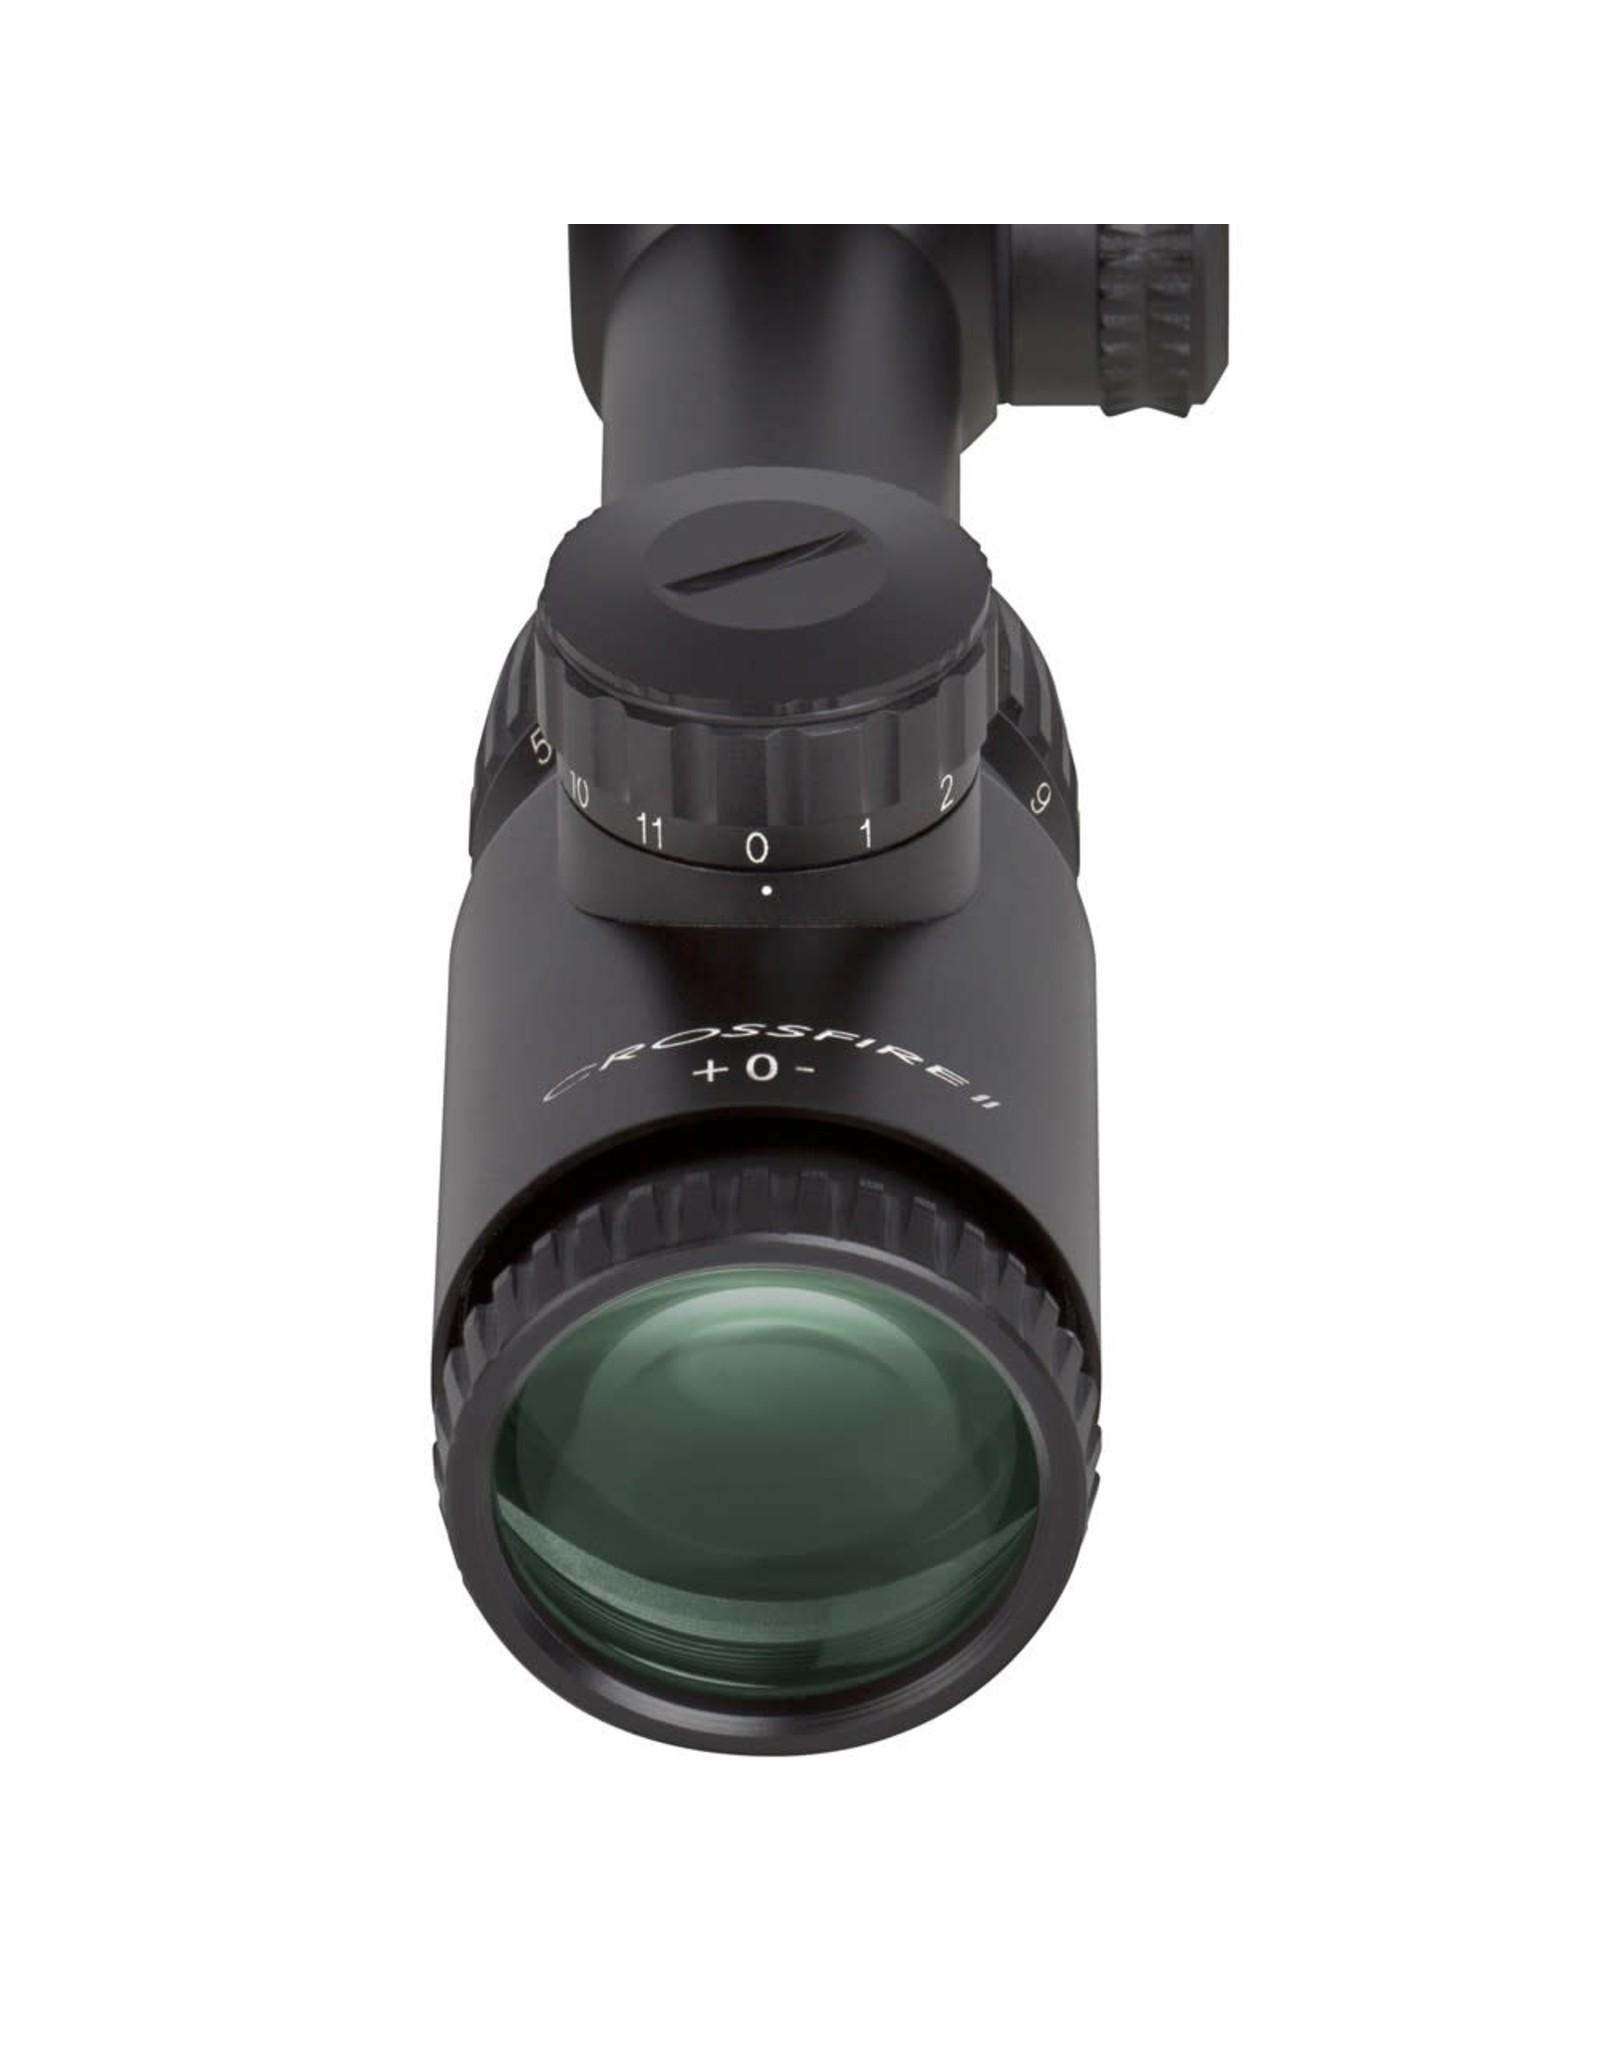 "Vortex Optics VORTEX CROSSFIRE II 3-9x40 RIFLESCOPE 1"" TUBE CF2-31025"